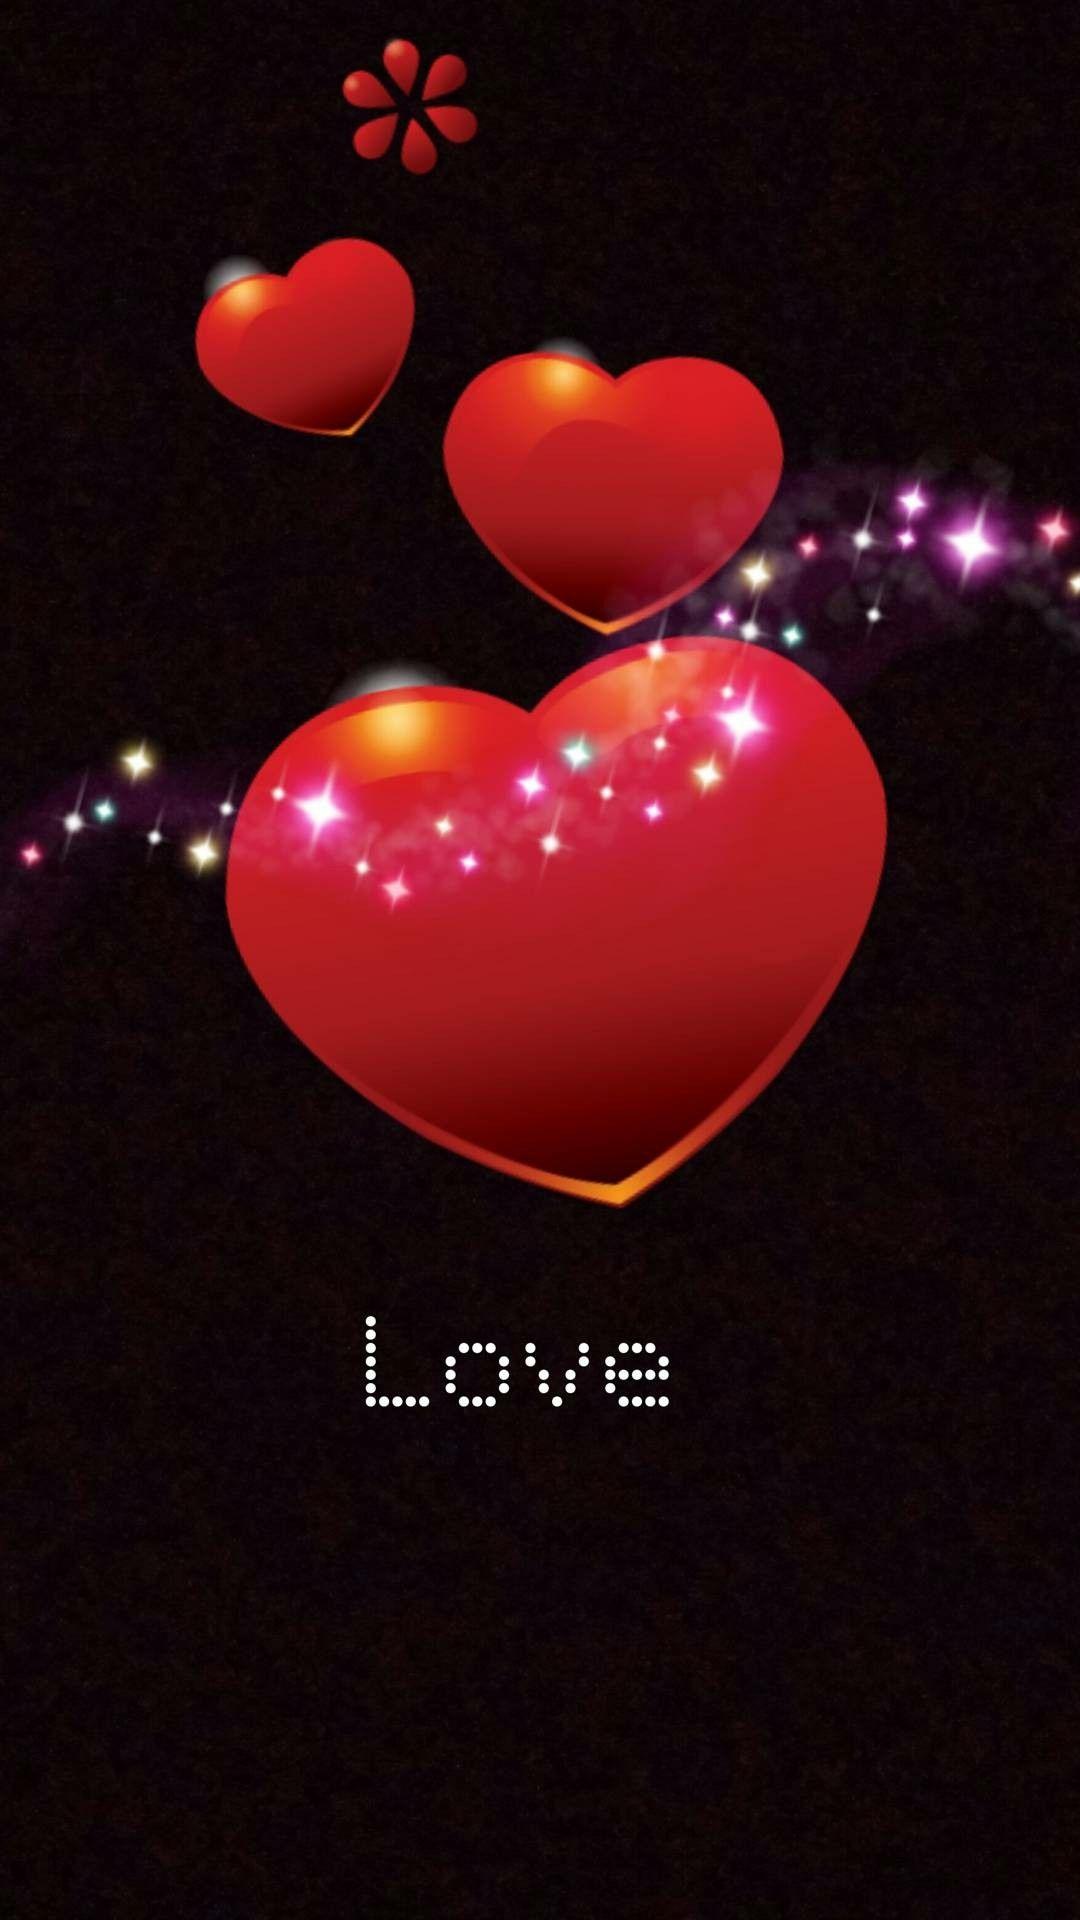 Heart S In Love Valentines Wallpaper Love Wallpaper Love Wallpaper Backgrounds Love images wallpaper hd full screen